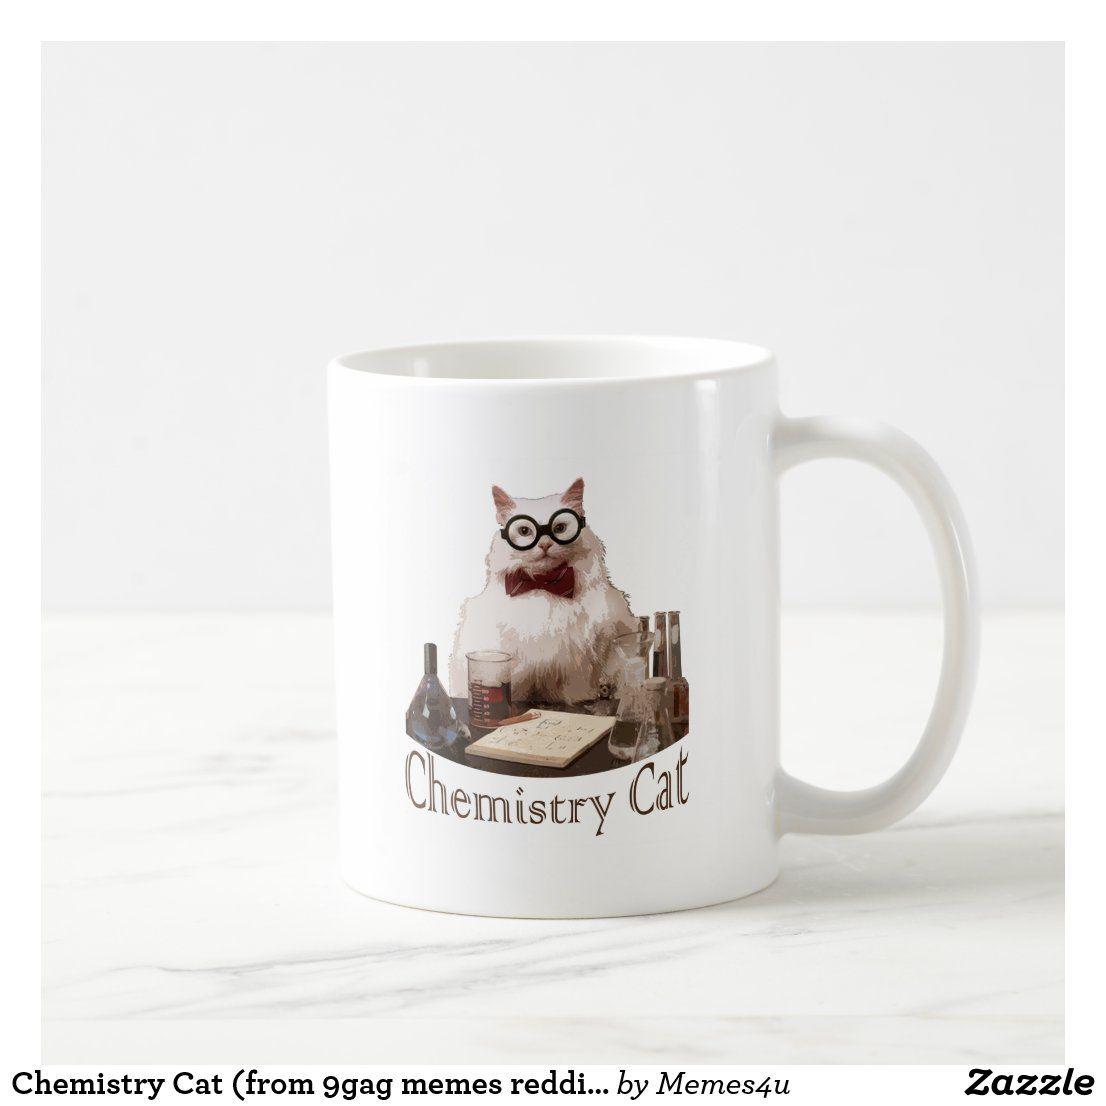 Chemistry cat from 9gag memes reddit coffee mug zazzle